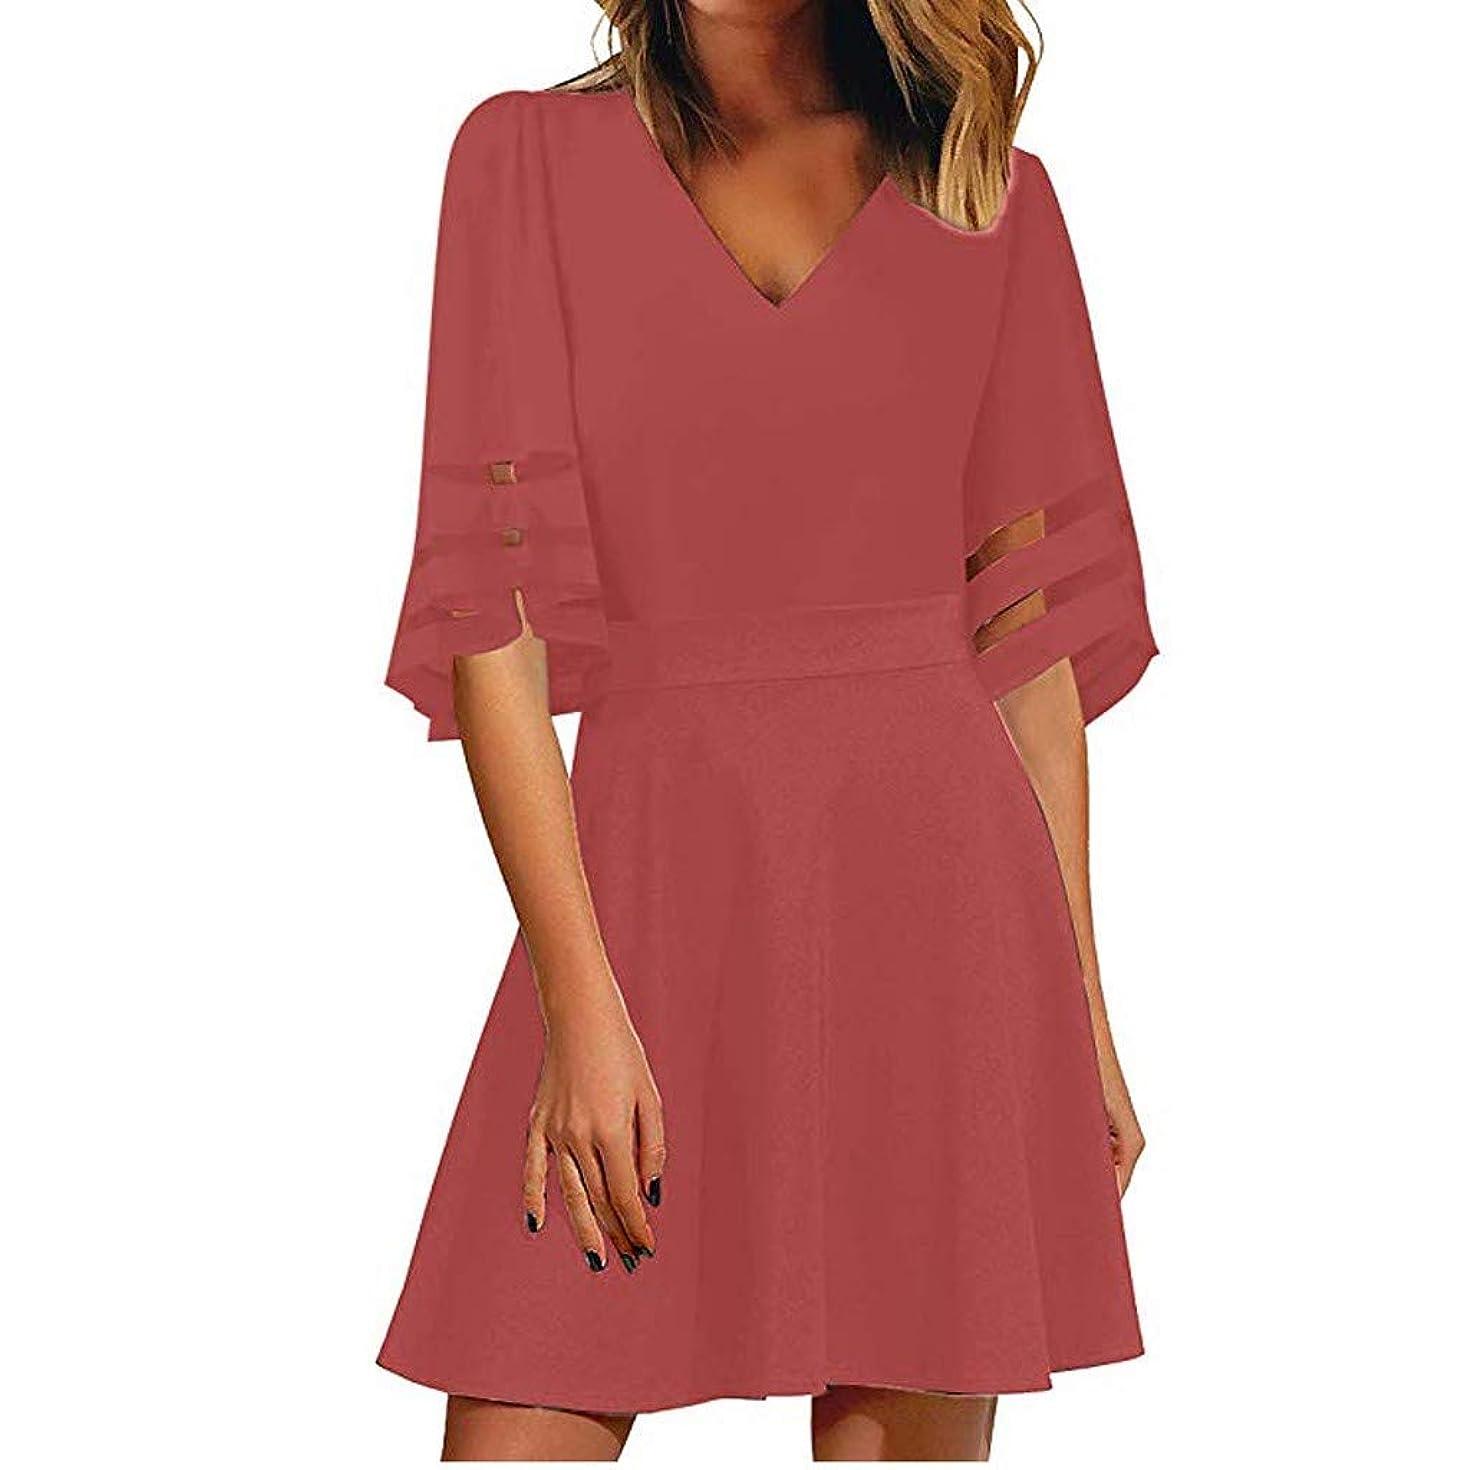 Women's Dresses,Women's V Neck Mesh Panel Dress 3/4 Bell Sleeve Loose Top Shirt Dress Solid Color Dress by Qingell